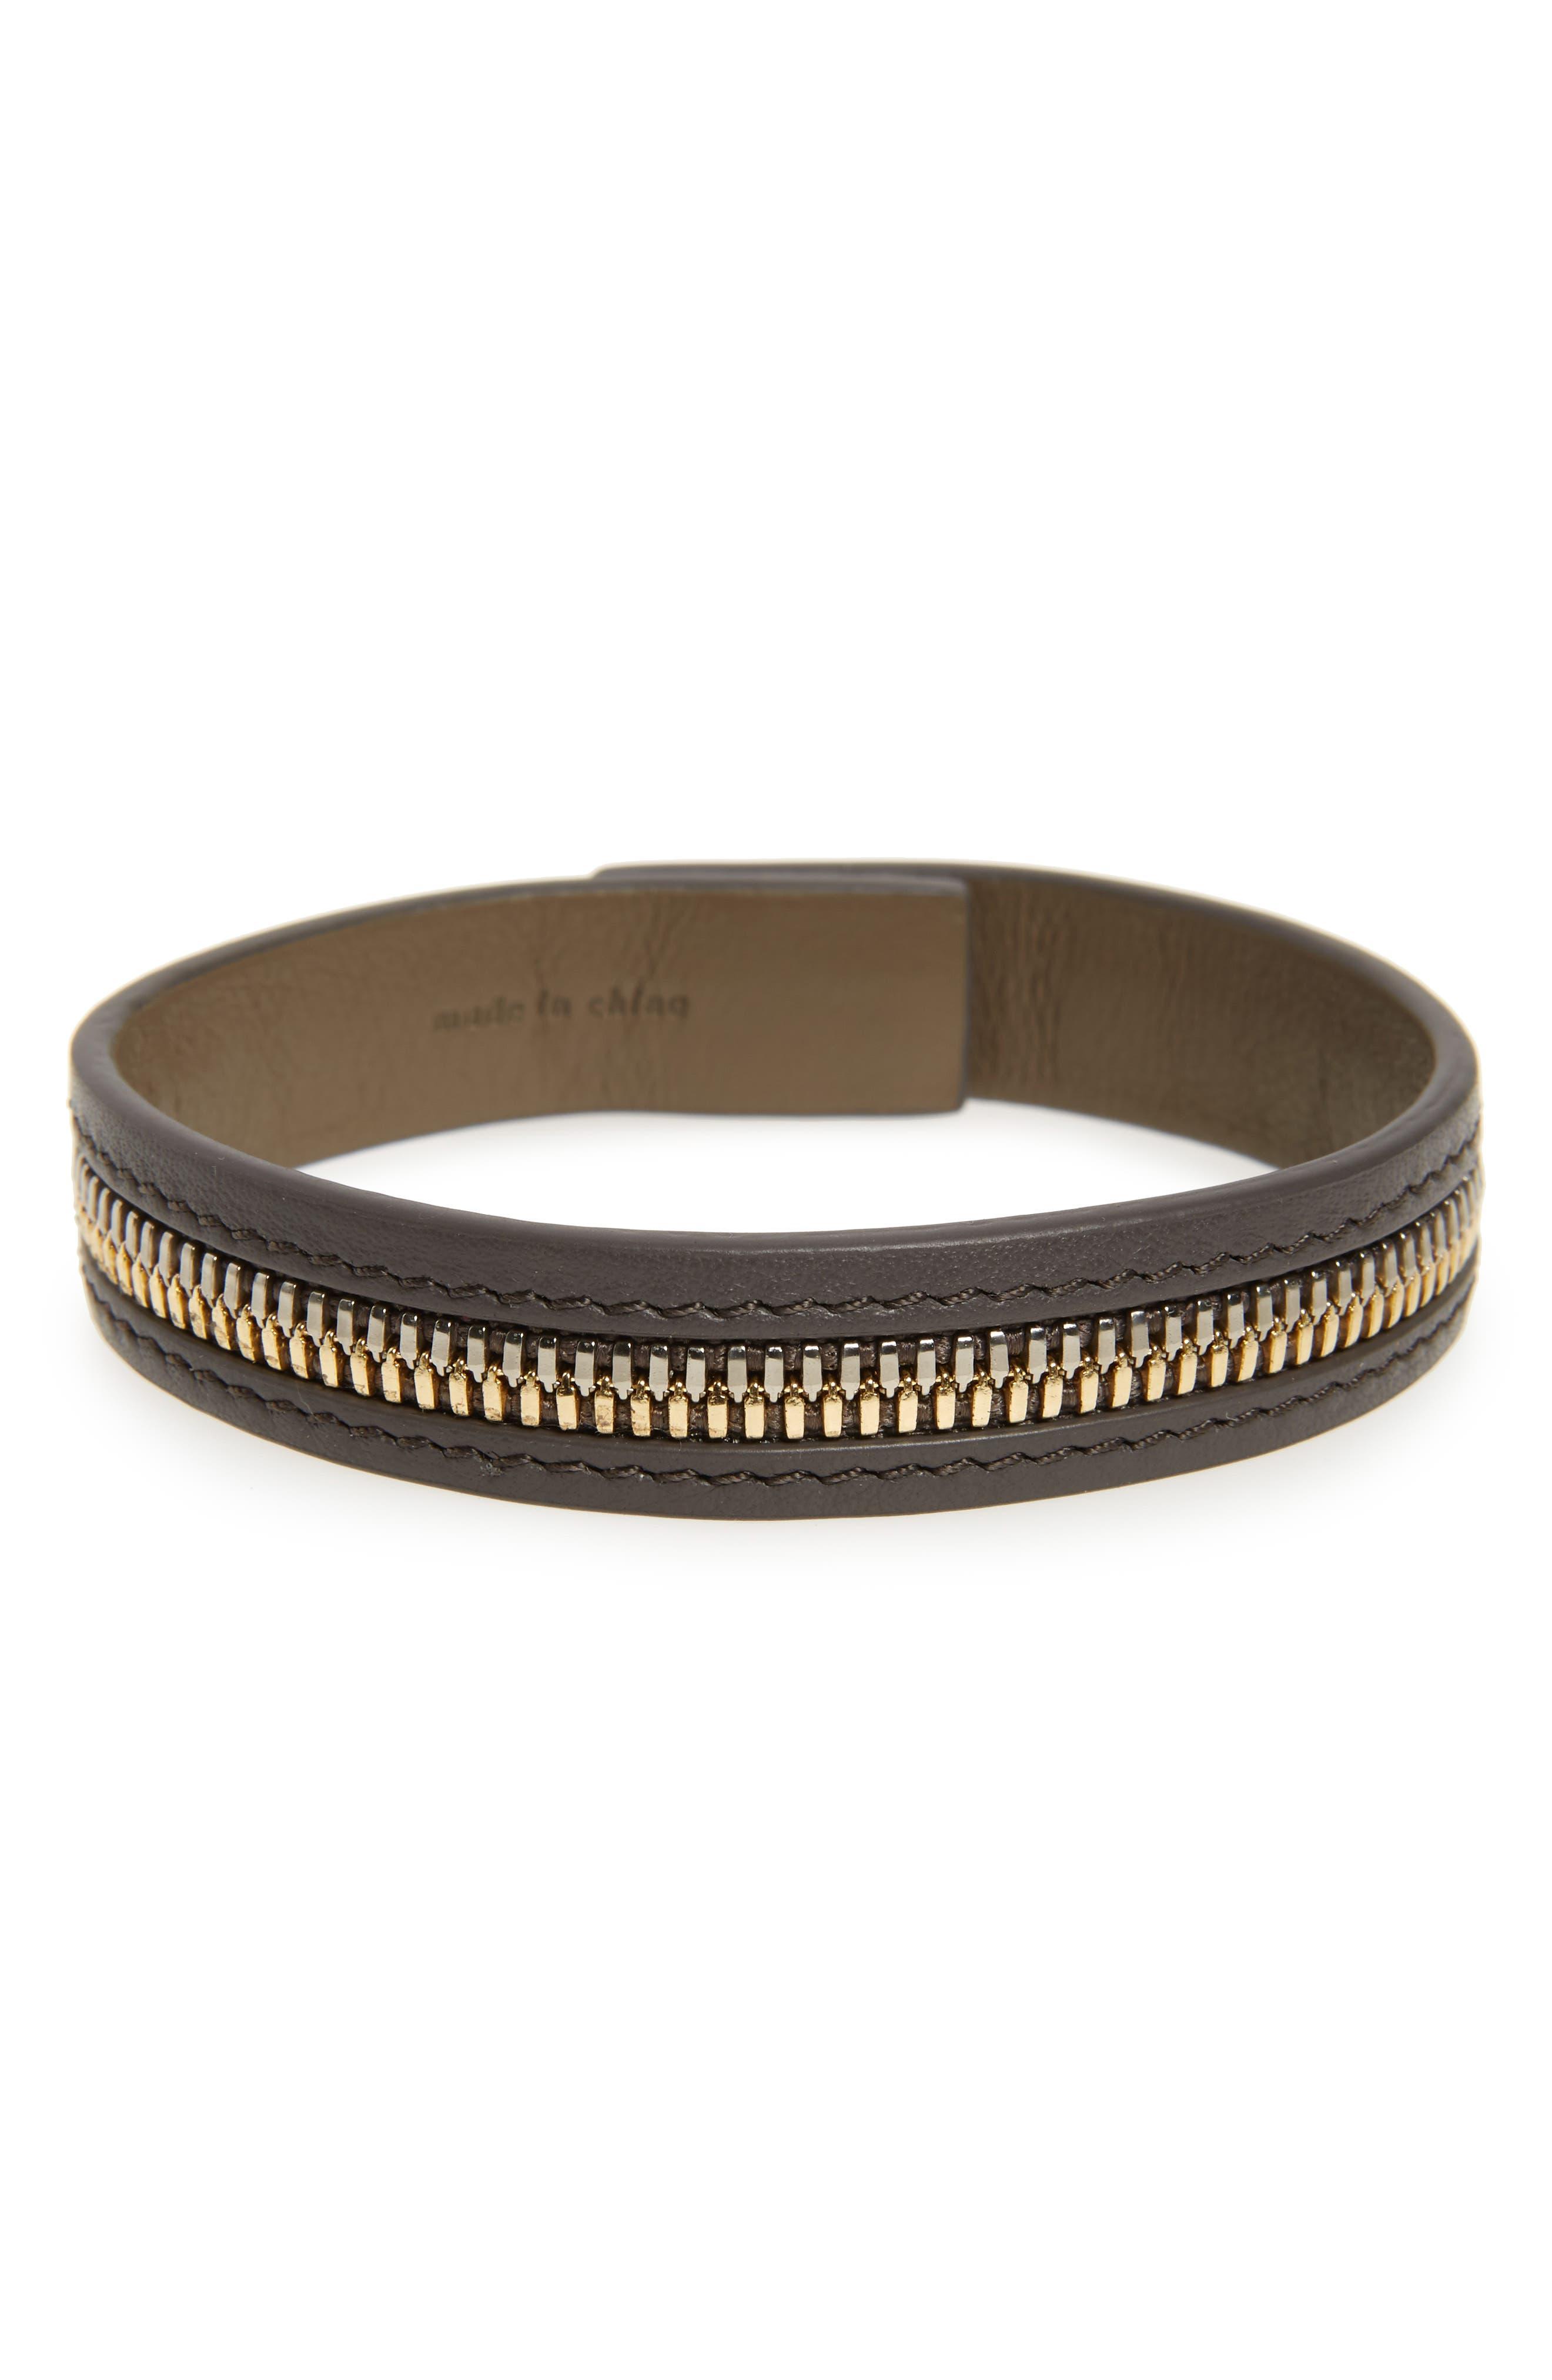 WANT LES ESSENTIELS 'Tambo' Zip Leather Bracelet